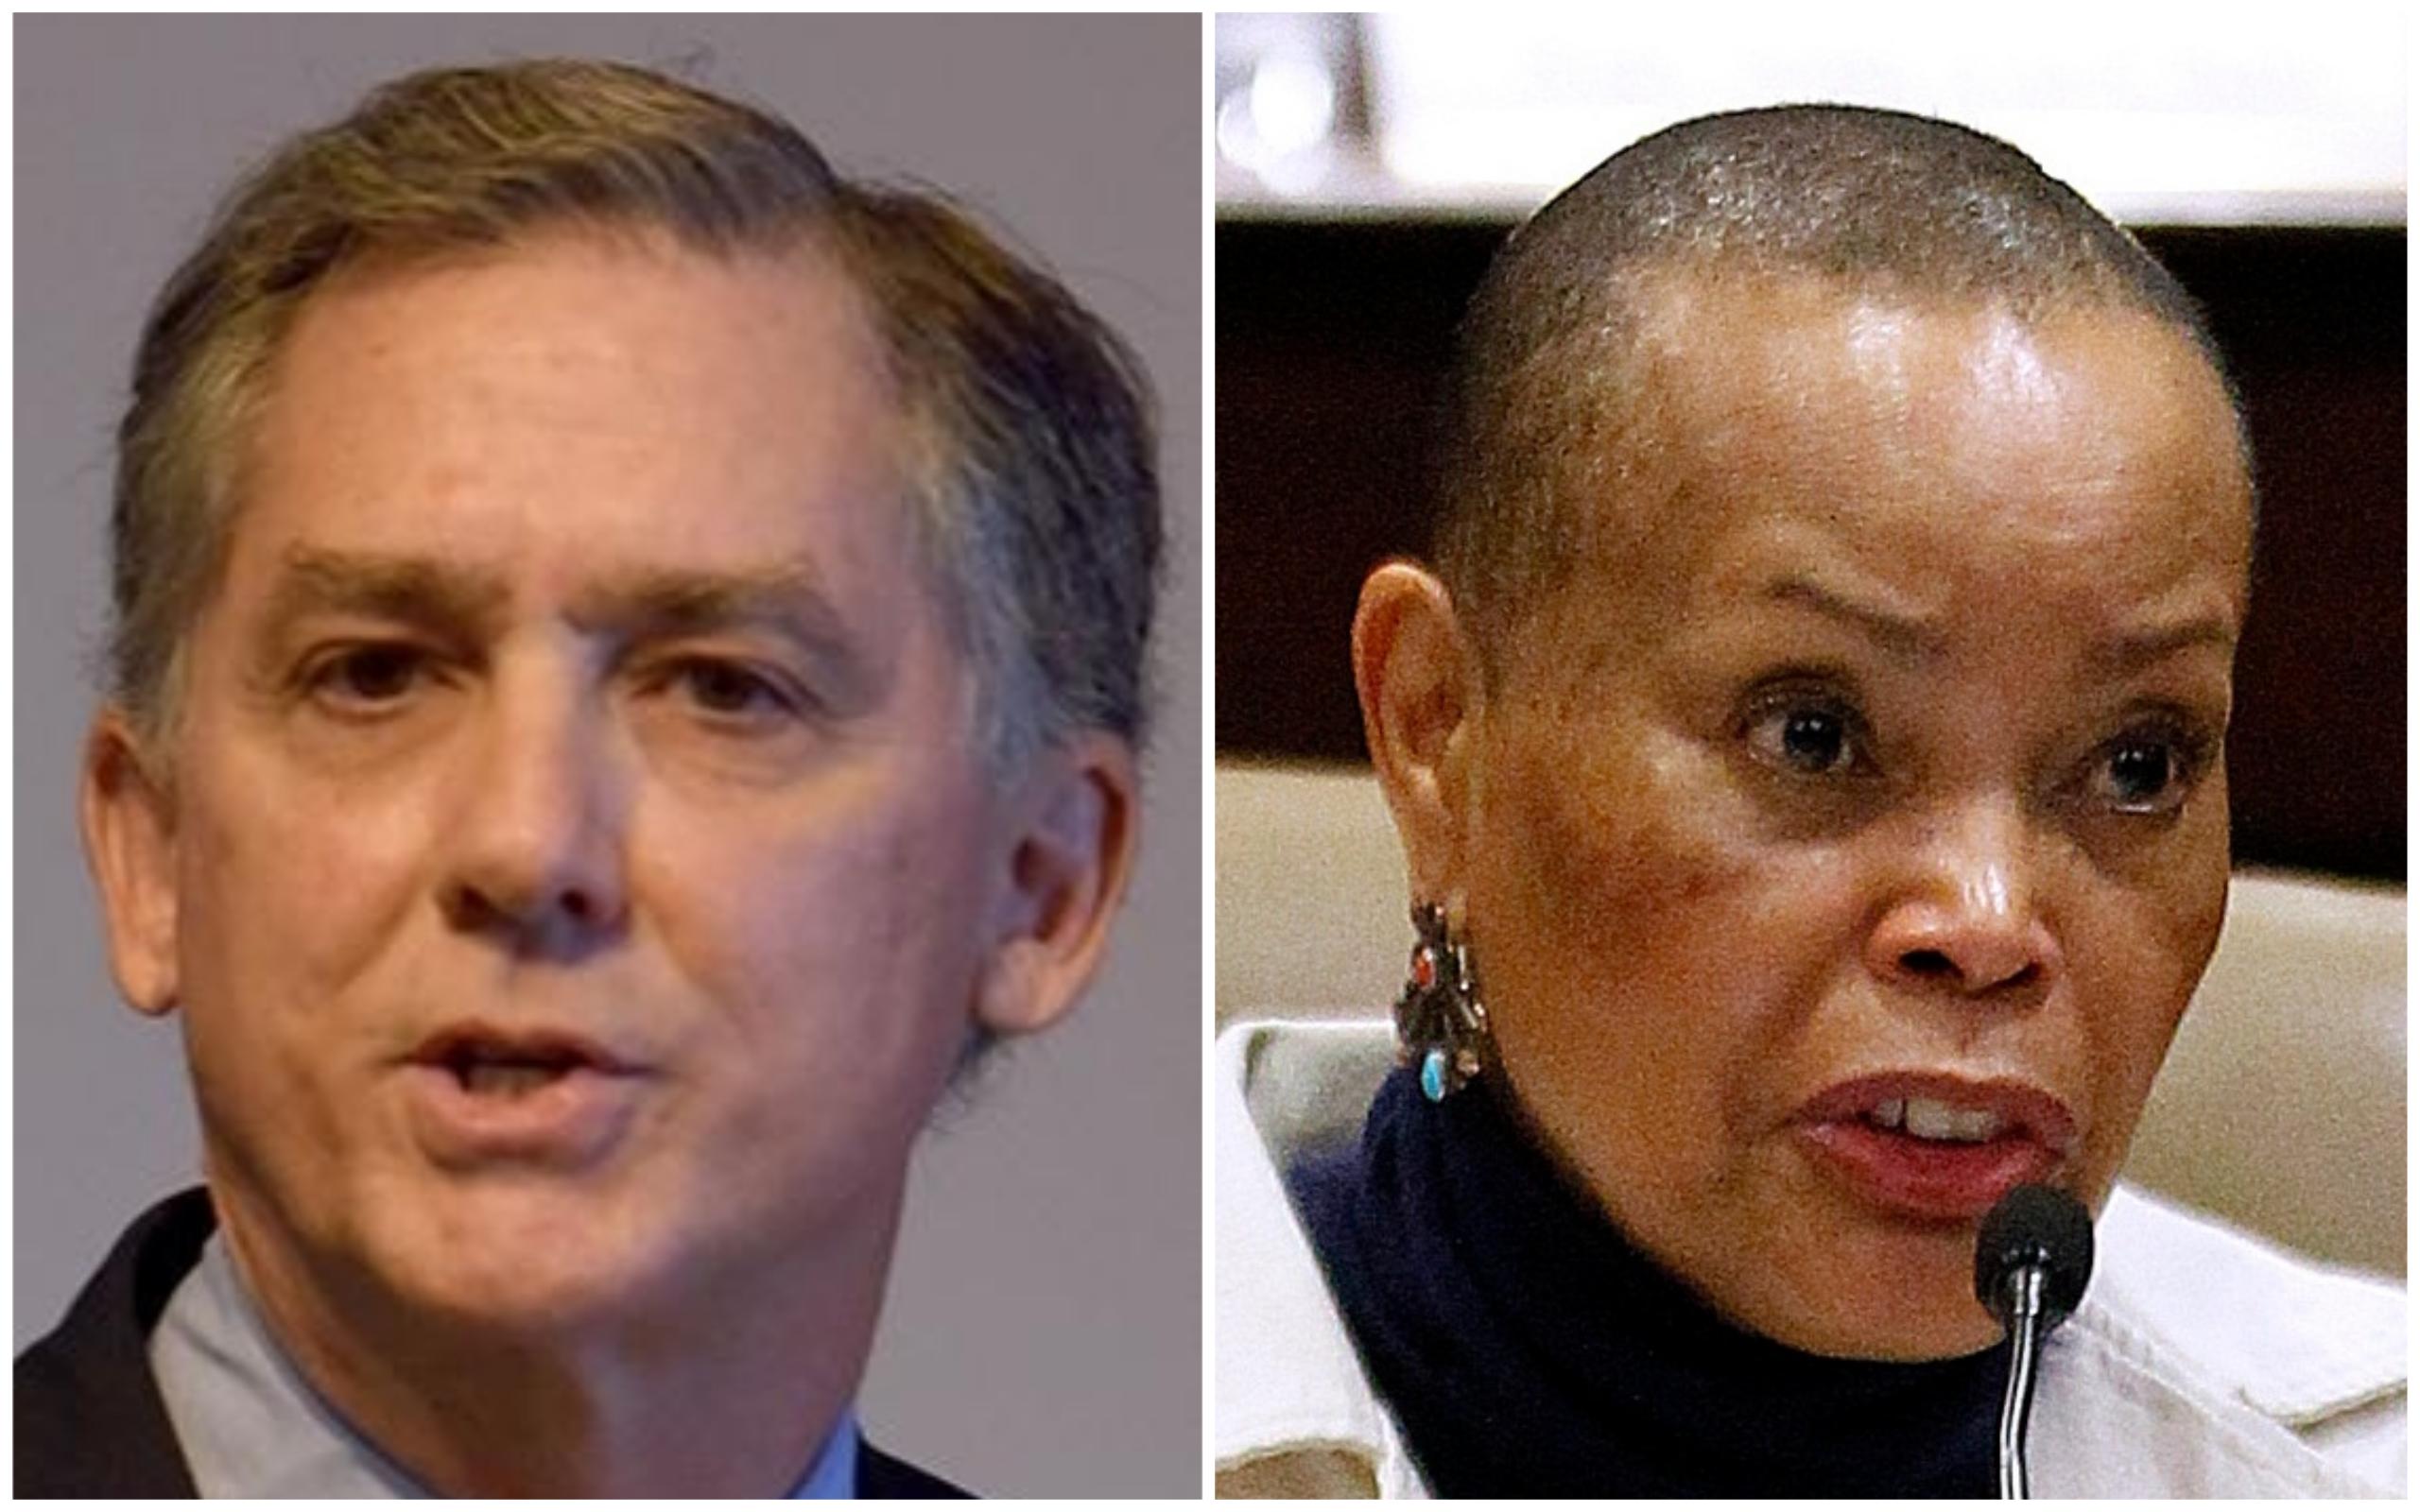 Hill, Elliott in tight race for U.S. House seat